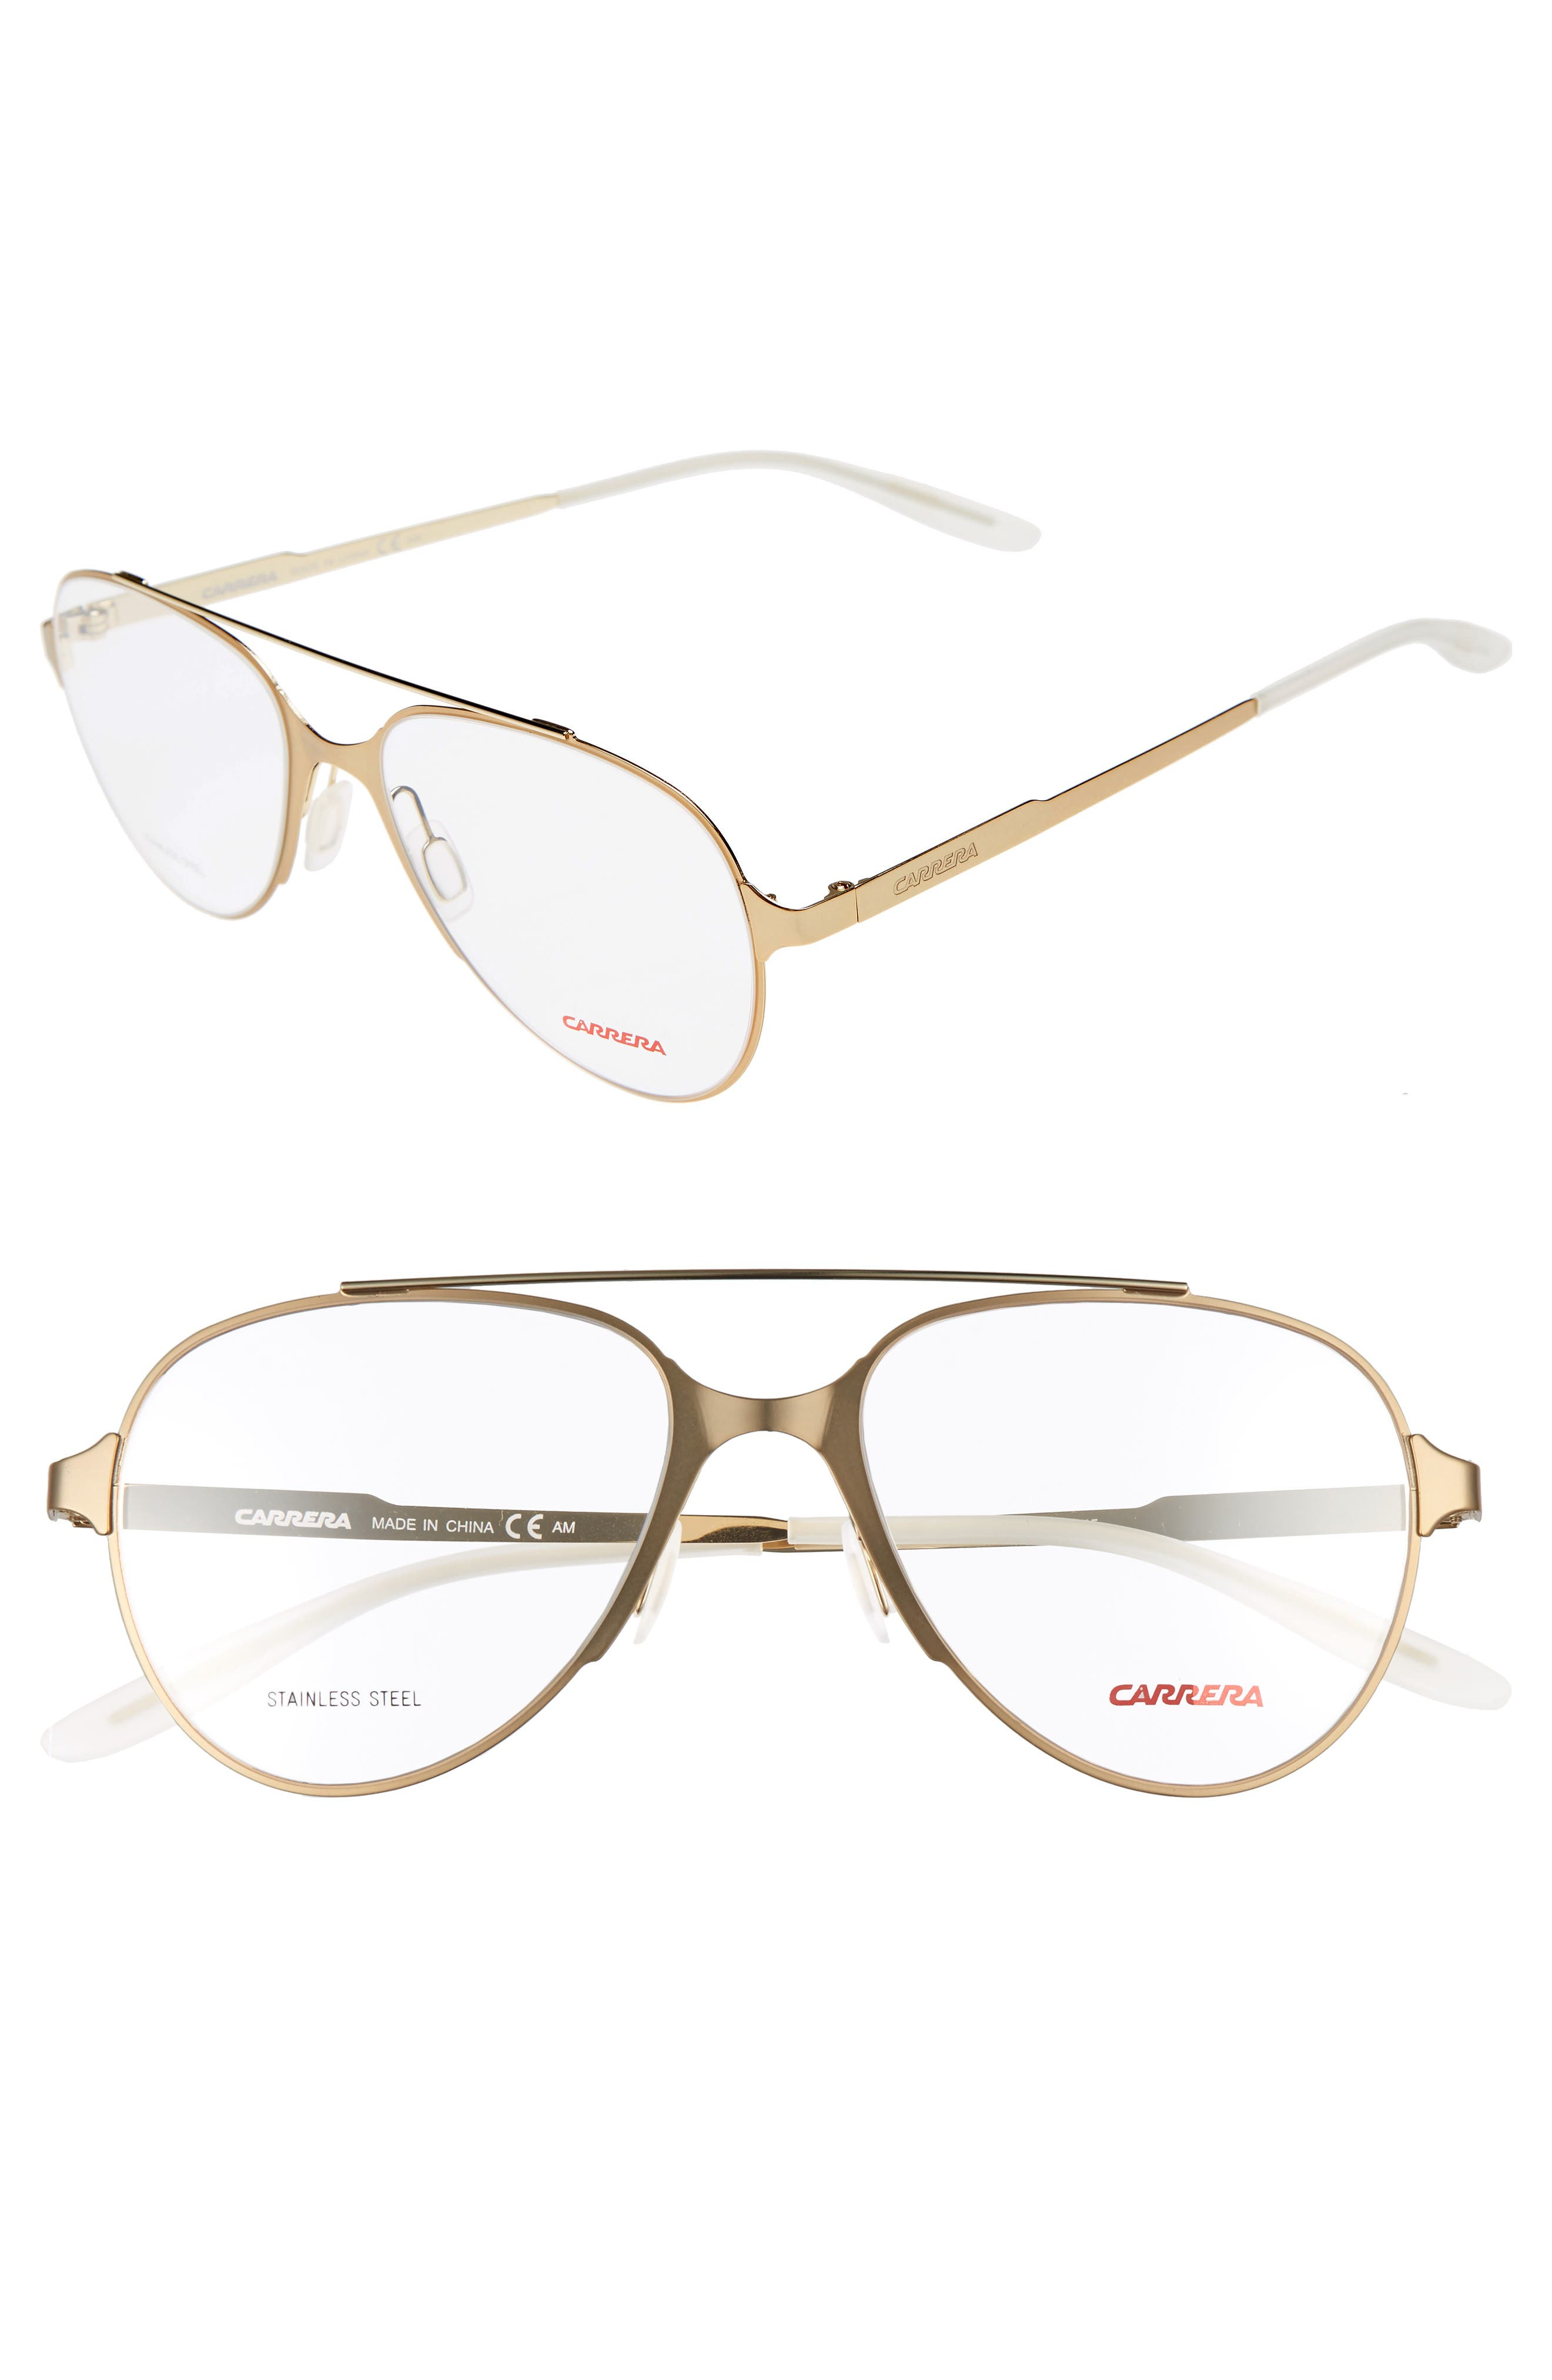 Carrera Eyewear 53mm Aviator Optical Frames